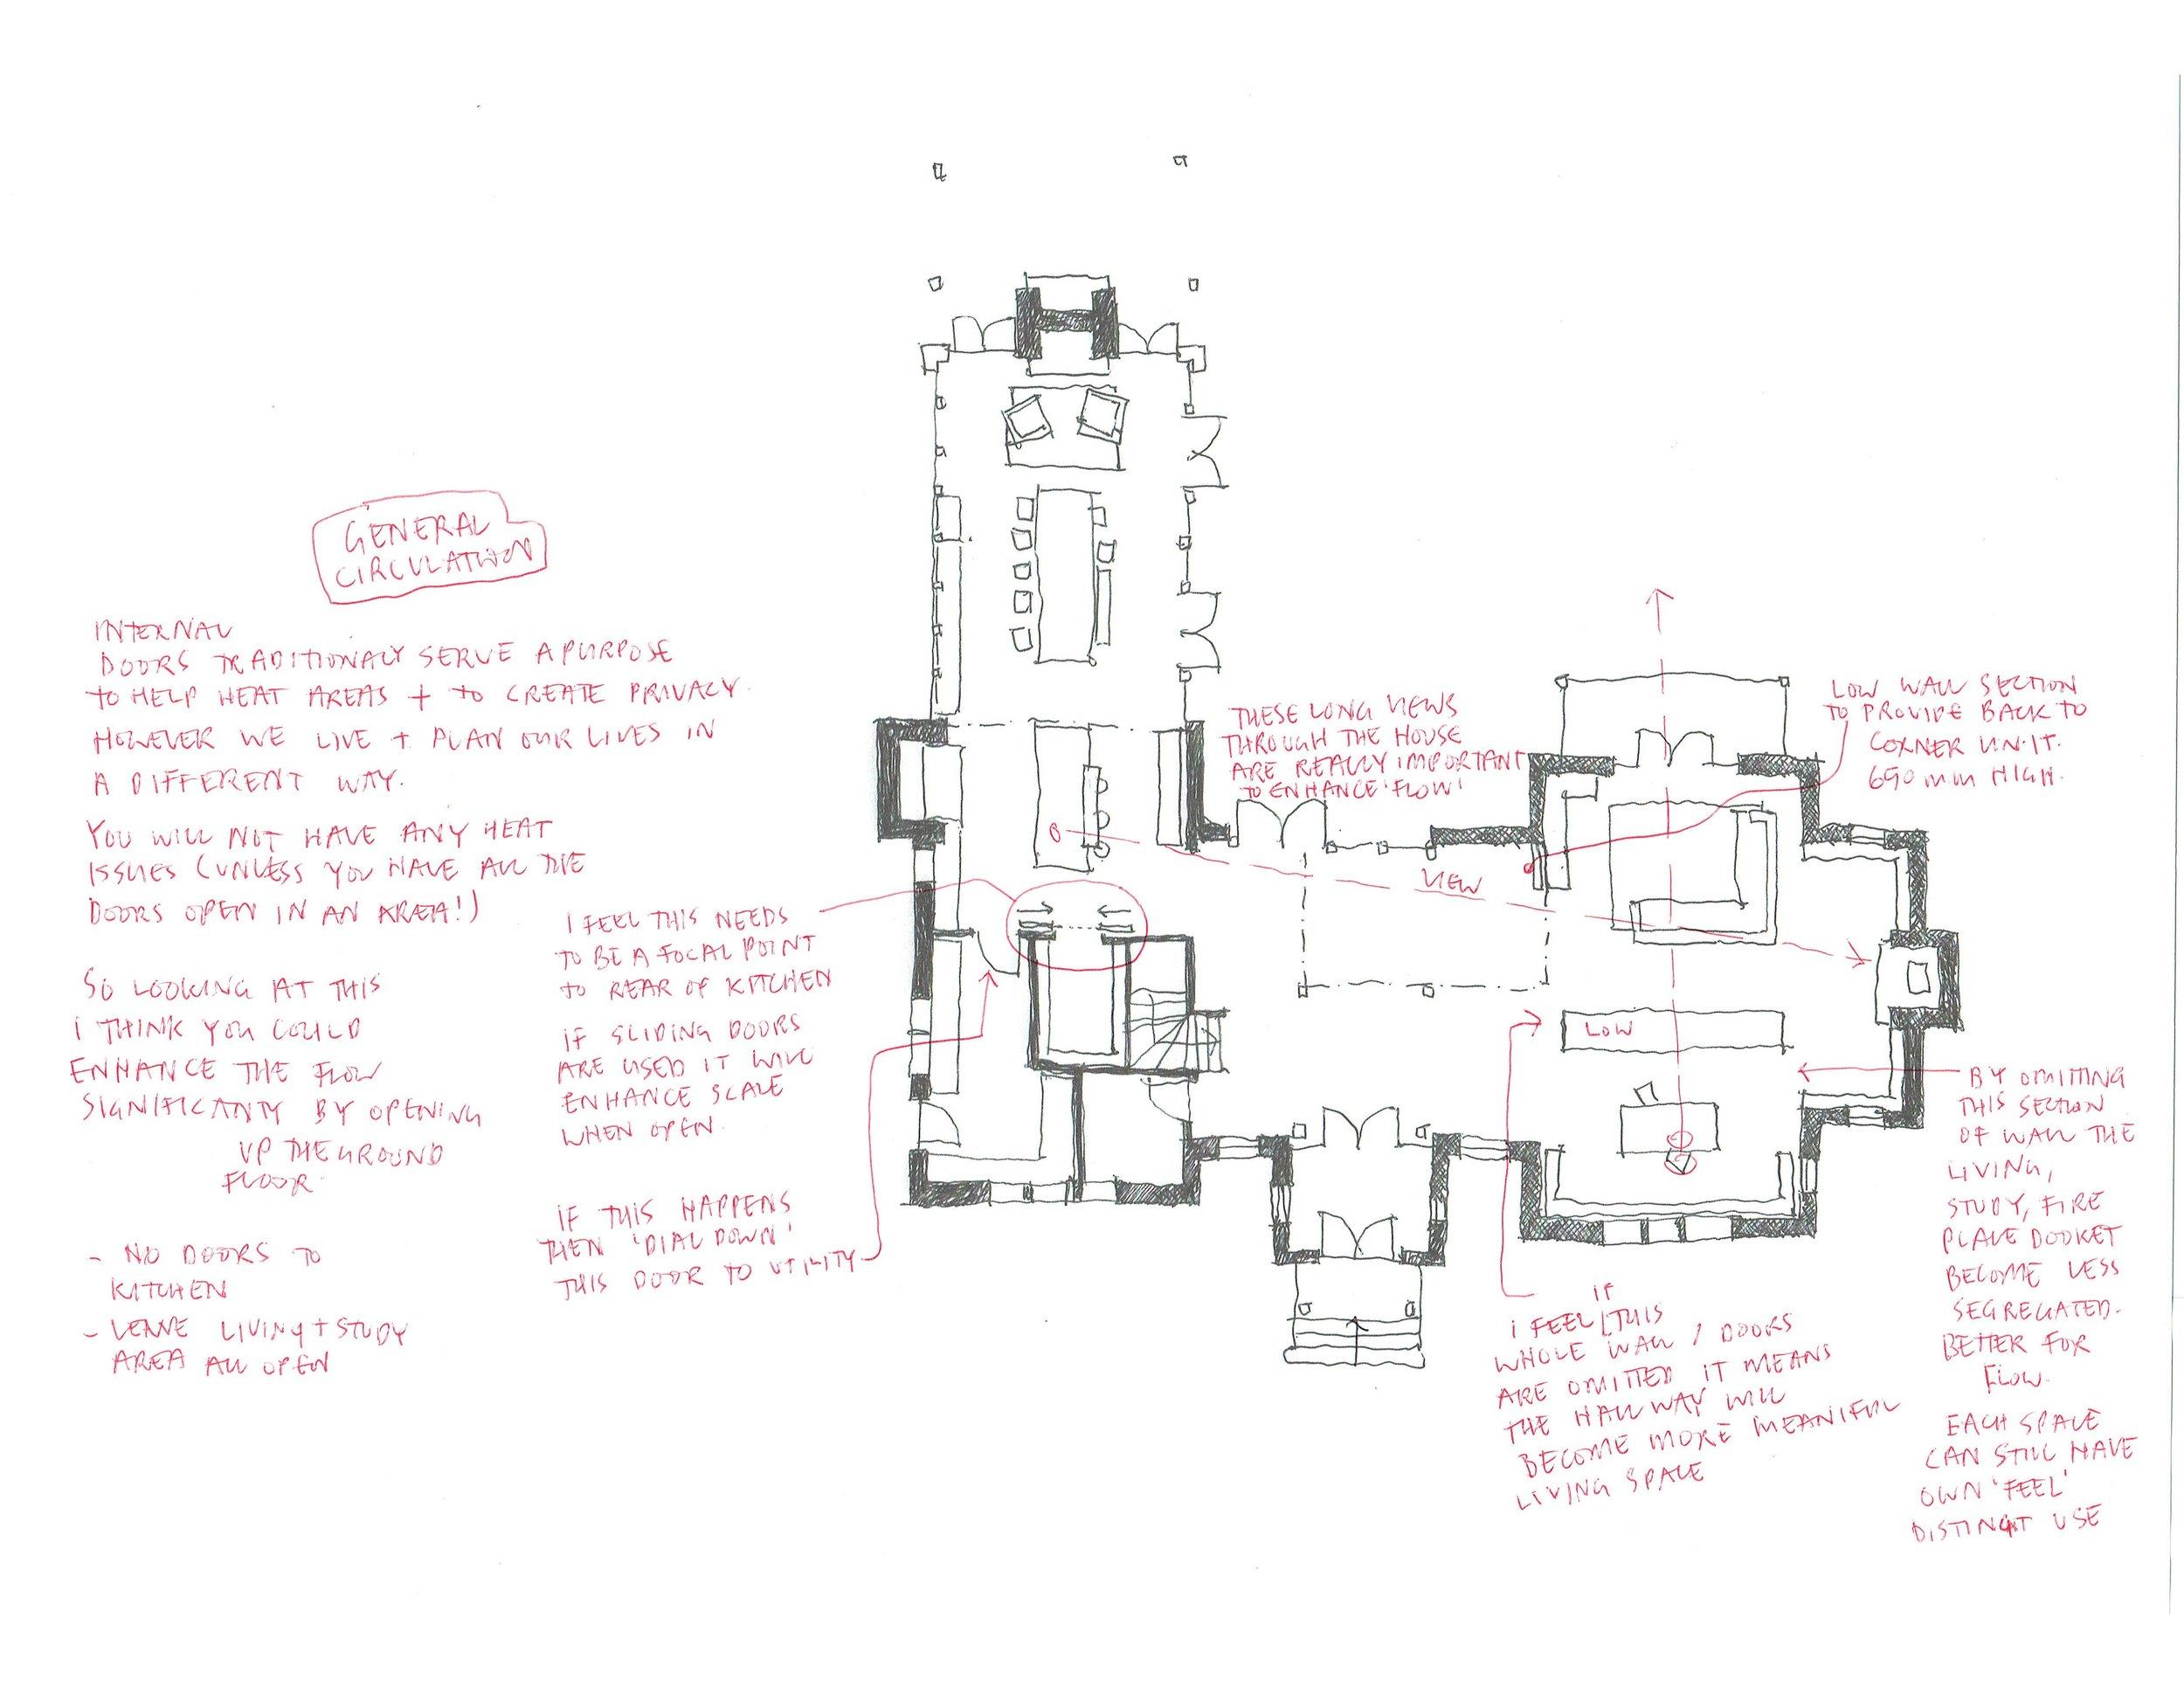 West Priestgill sketches_Page_1.jpg